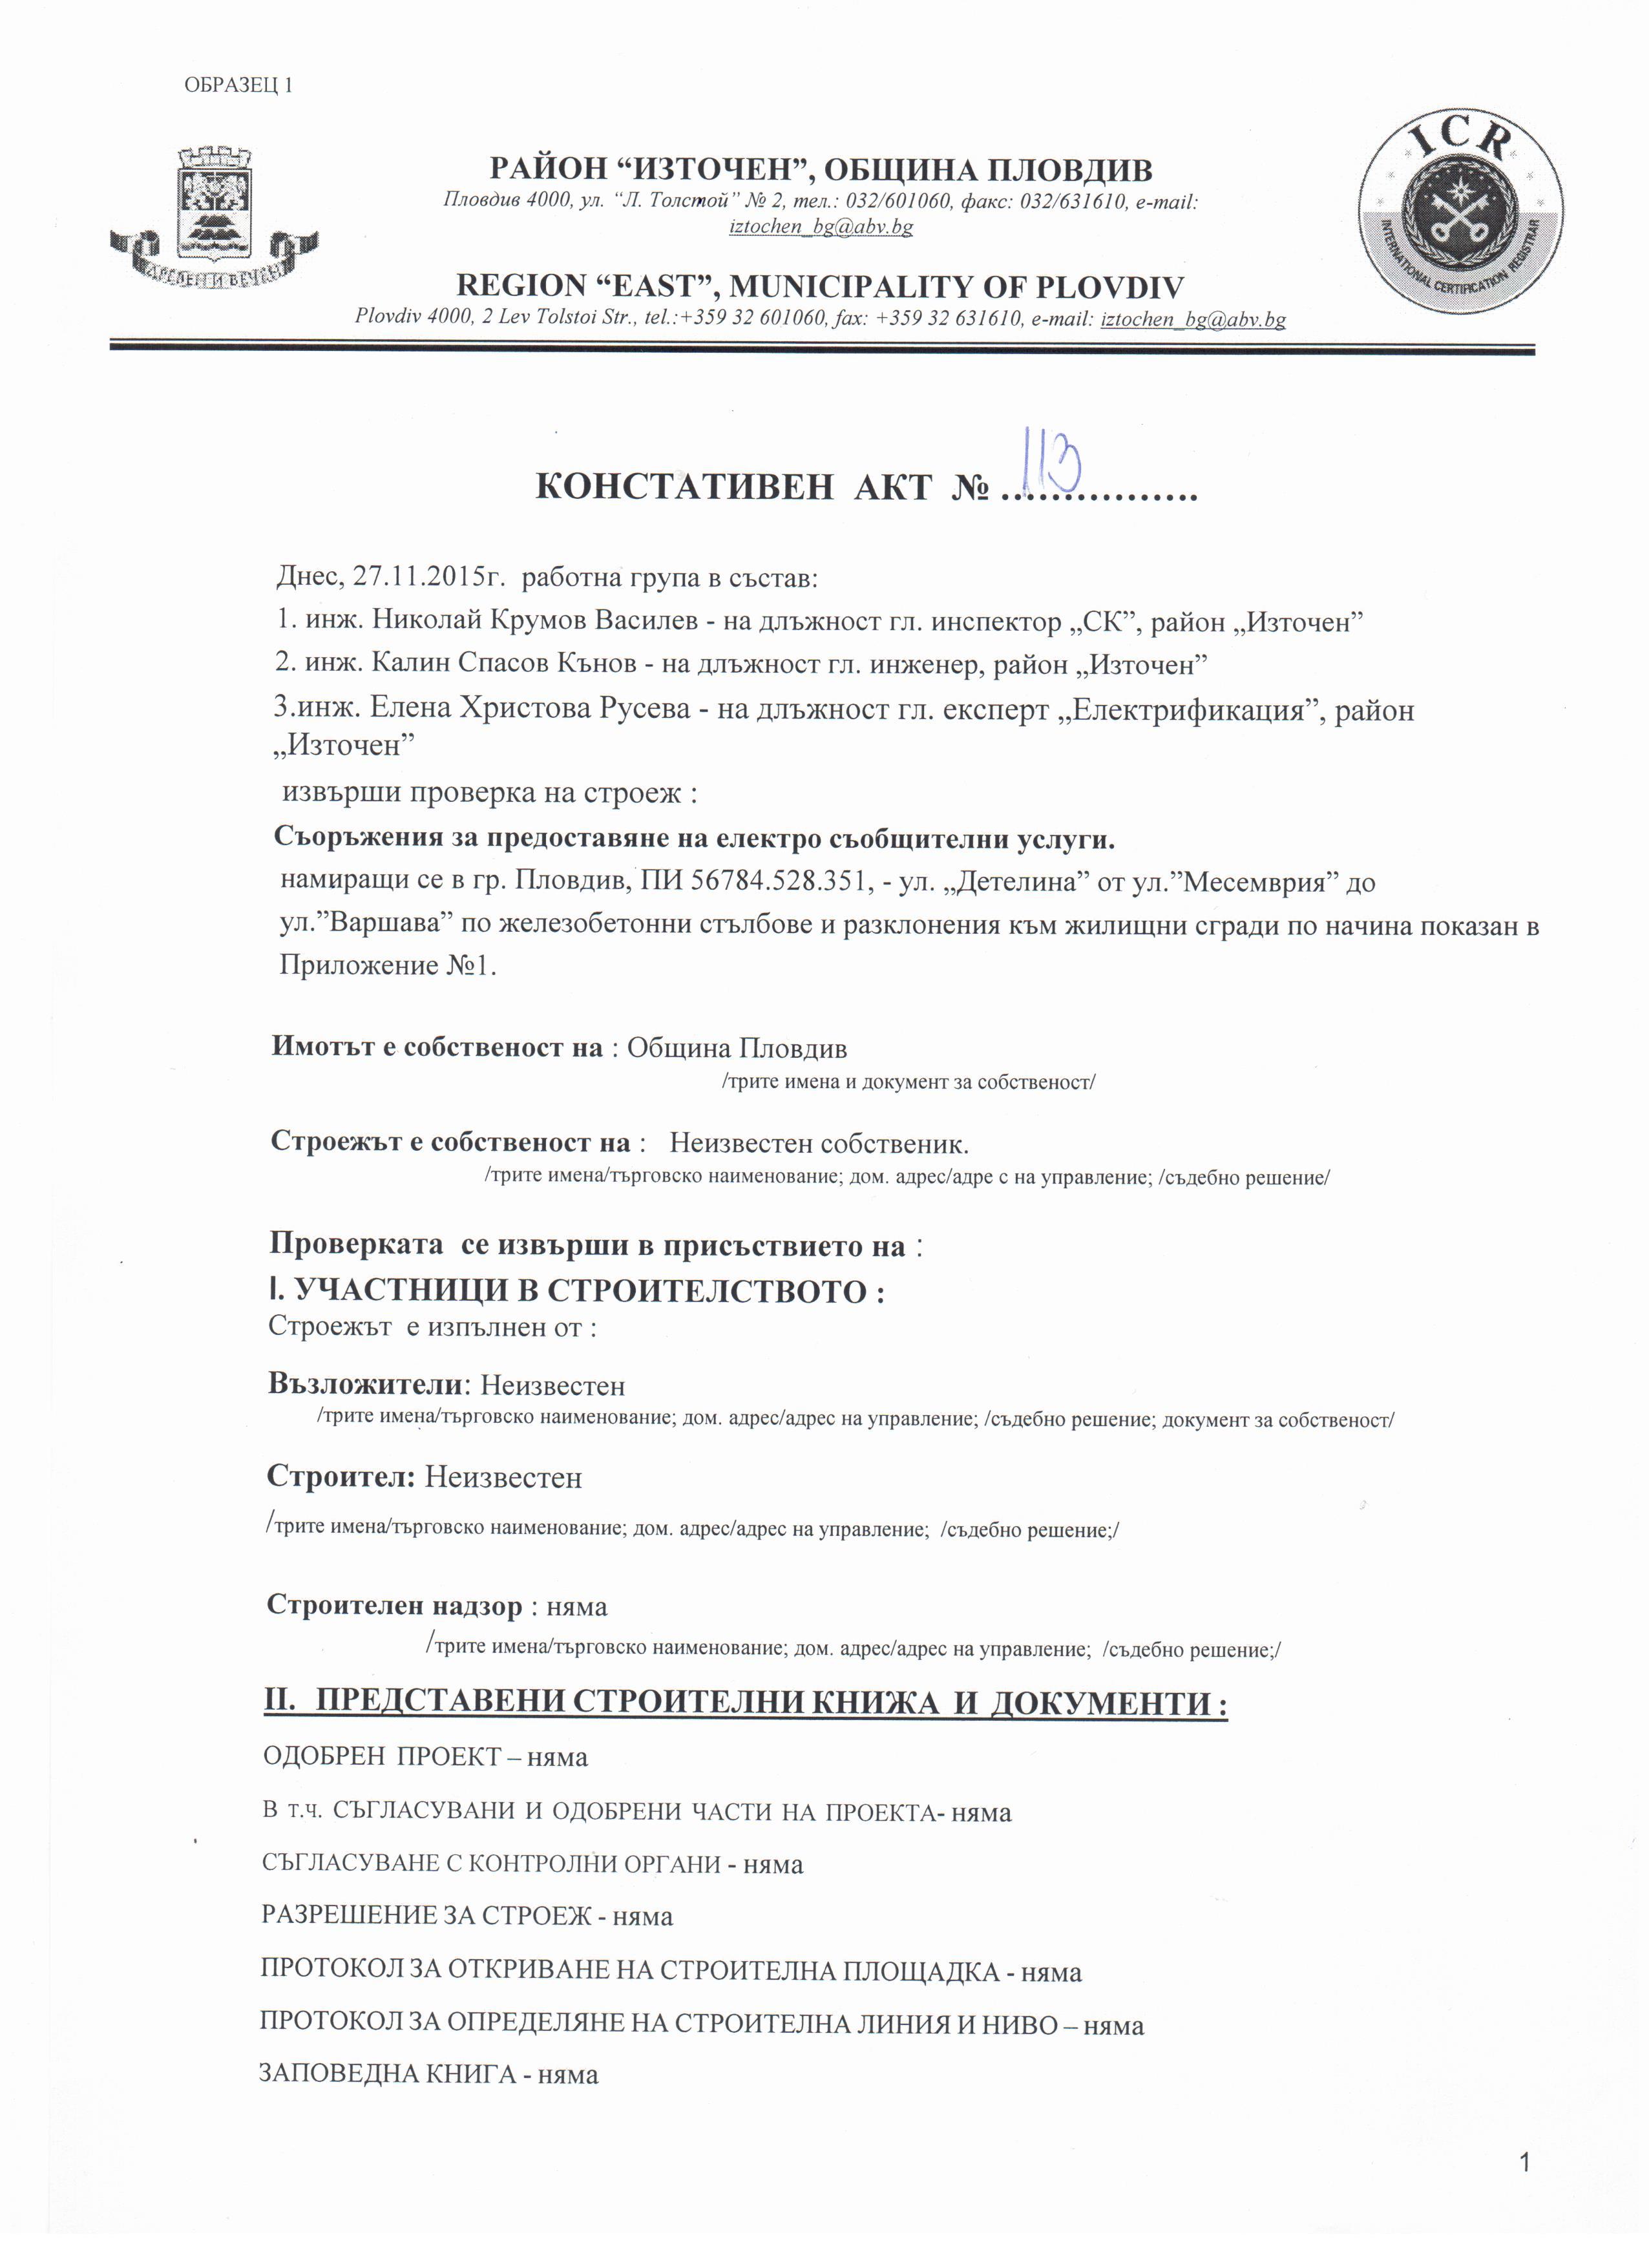 KONSTATIVEN_AKT_№113